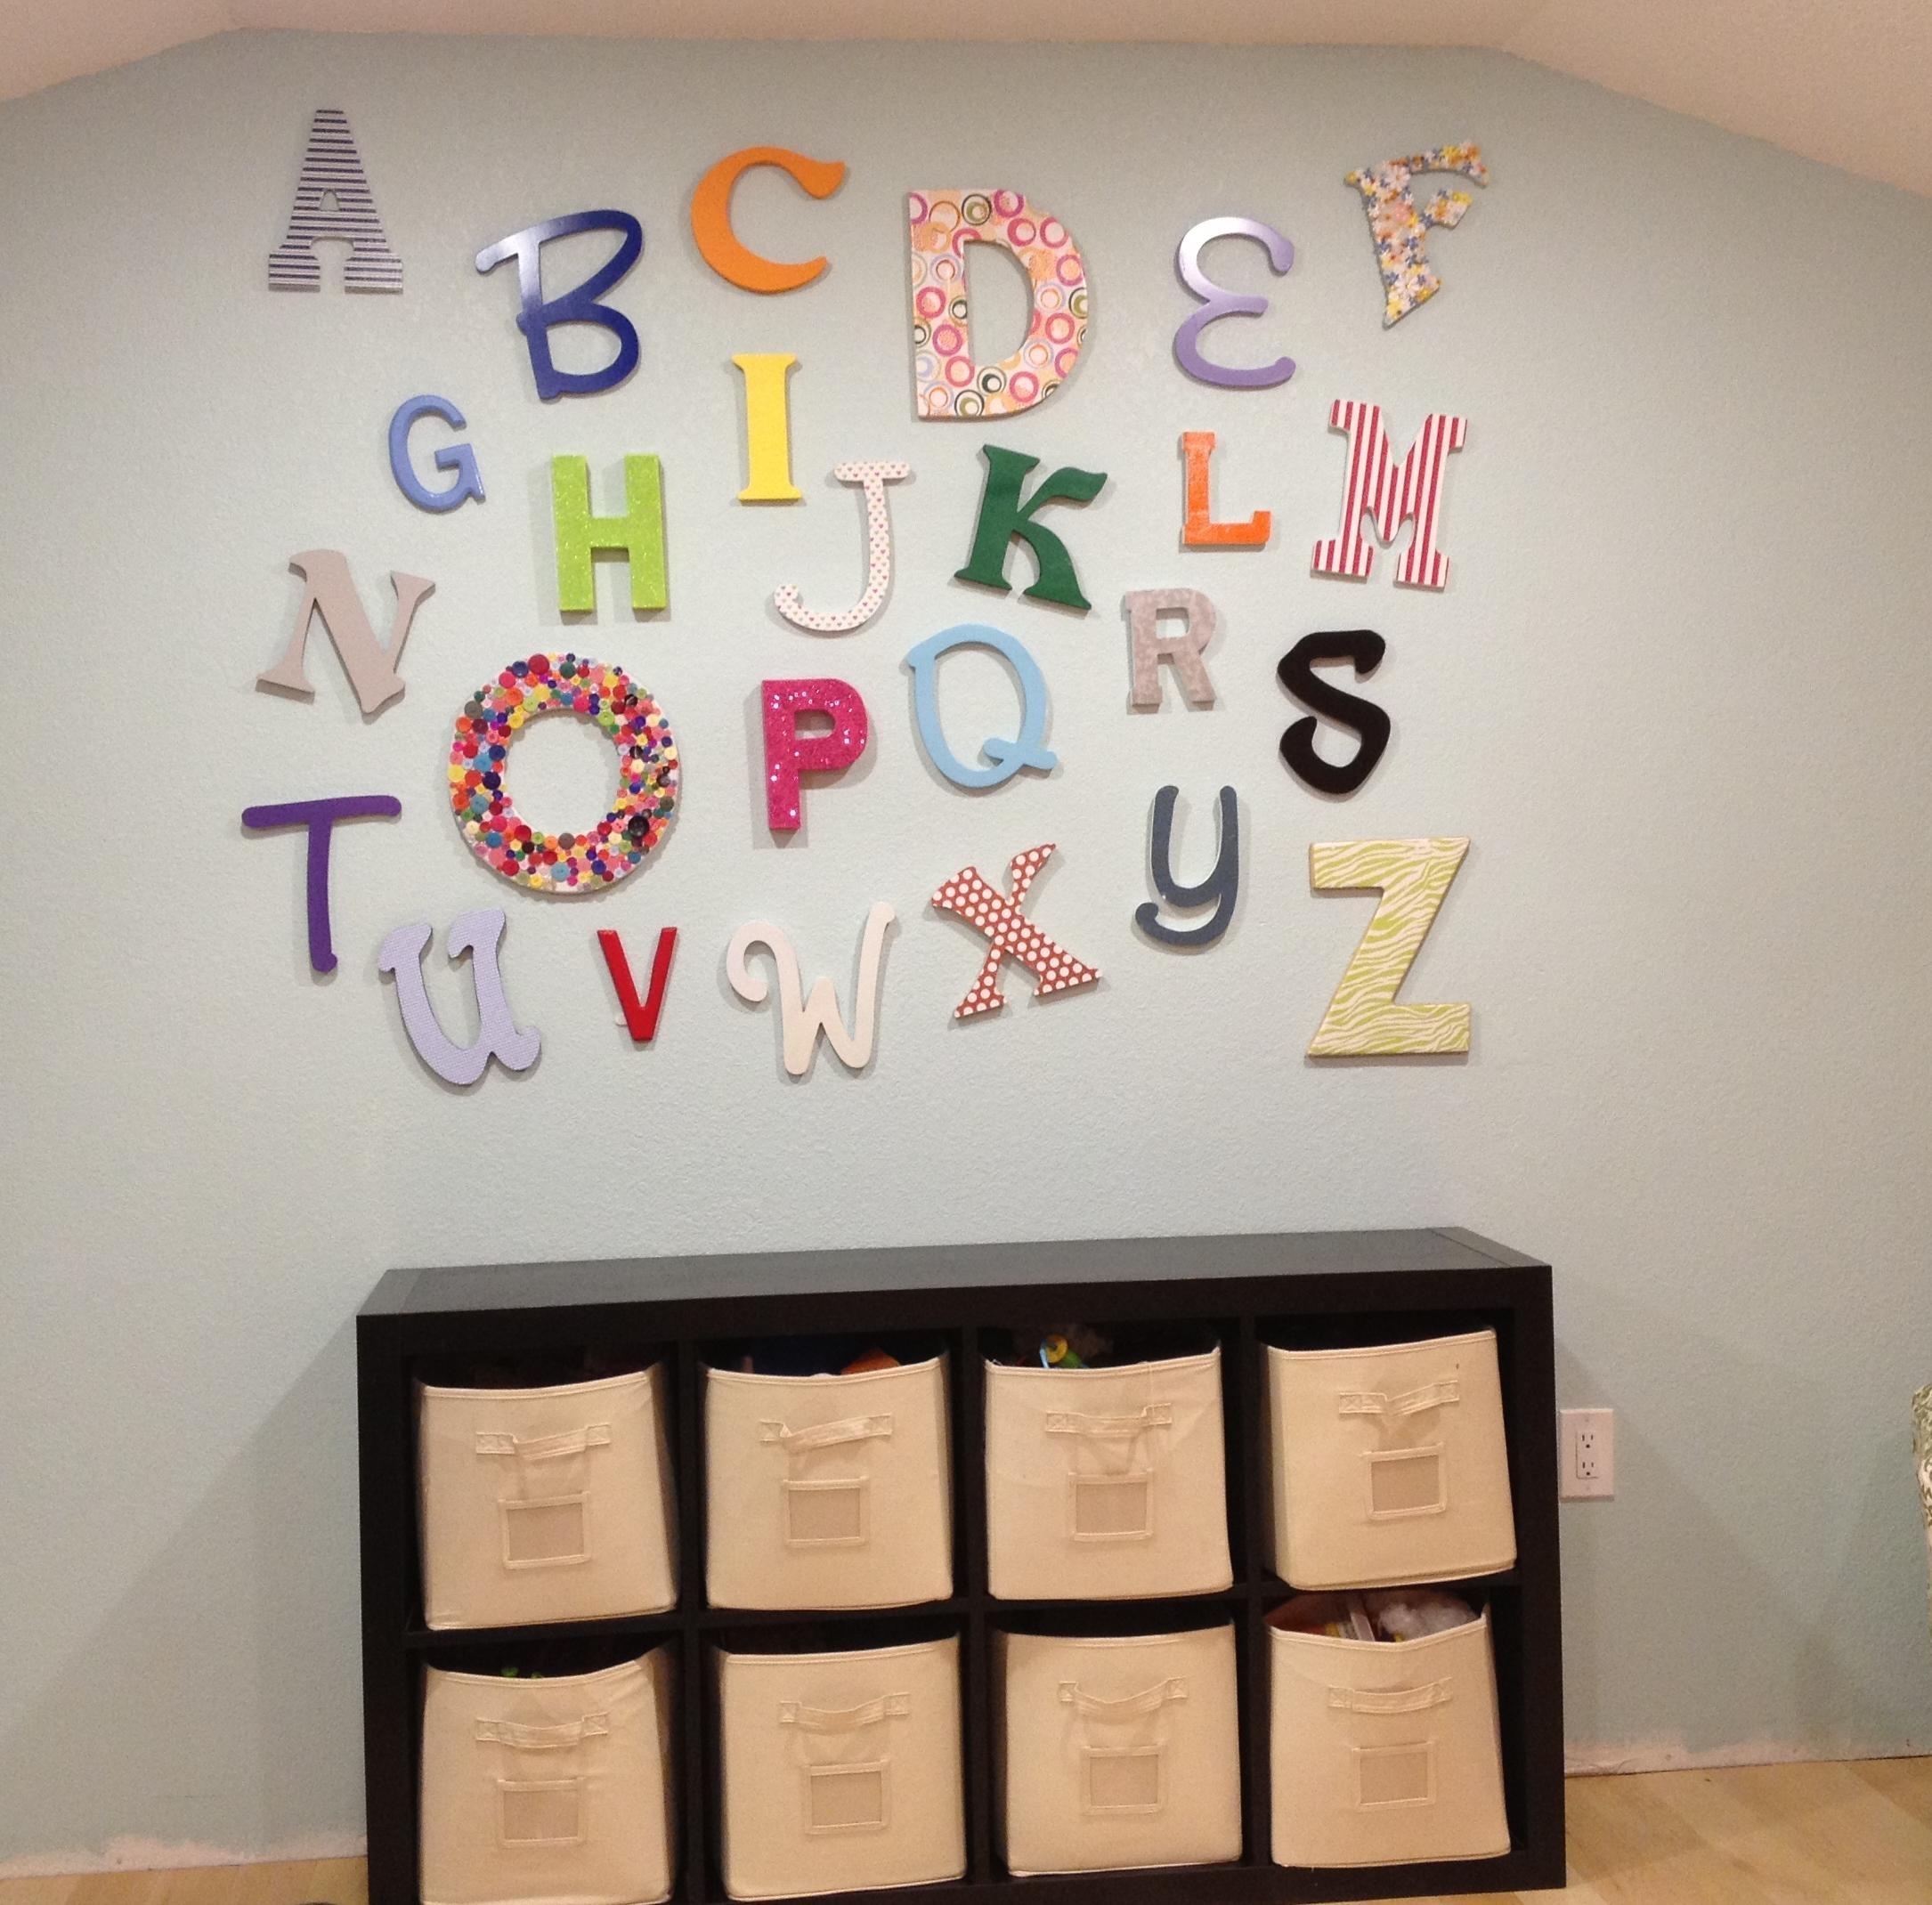 Playroom Wall Decor Ideas #12496 Regarding Wall Art For Playroom (View 14 of 20)